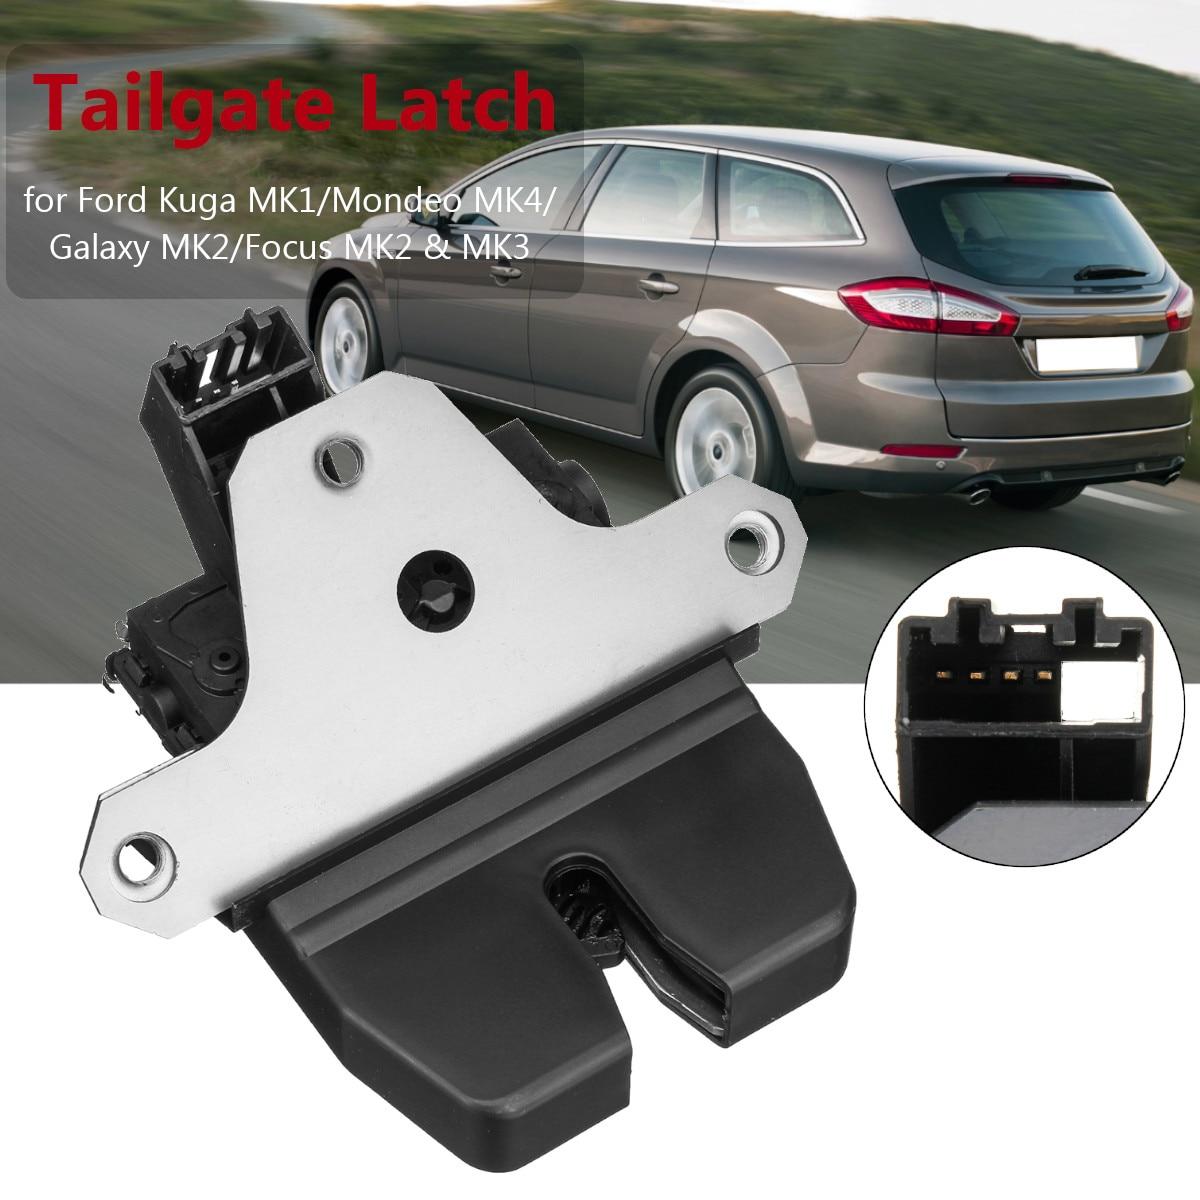 4Pin Tailgate Trunk Lock Latch For Ford Kuga MK1/Mondeo MK4/Galaxy MK2/Focus MK2 & MK3 1920840 1856670 8M51 R442A66DC4Pin Tailgate Trunk Lock Latch For Ford Kuga MK1/Mondeo MK4/Galaxy MK2/Focus MK2 & MK3 1920840 1856670 8M51 R442A66DC